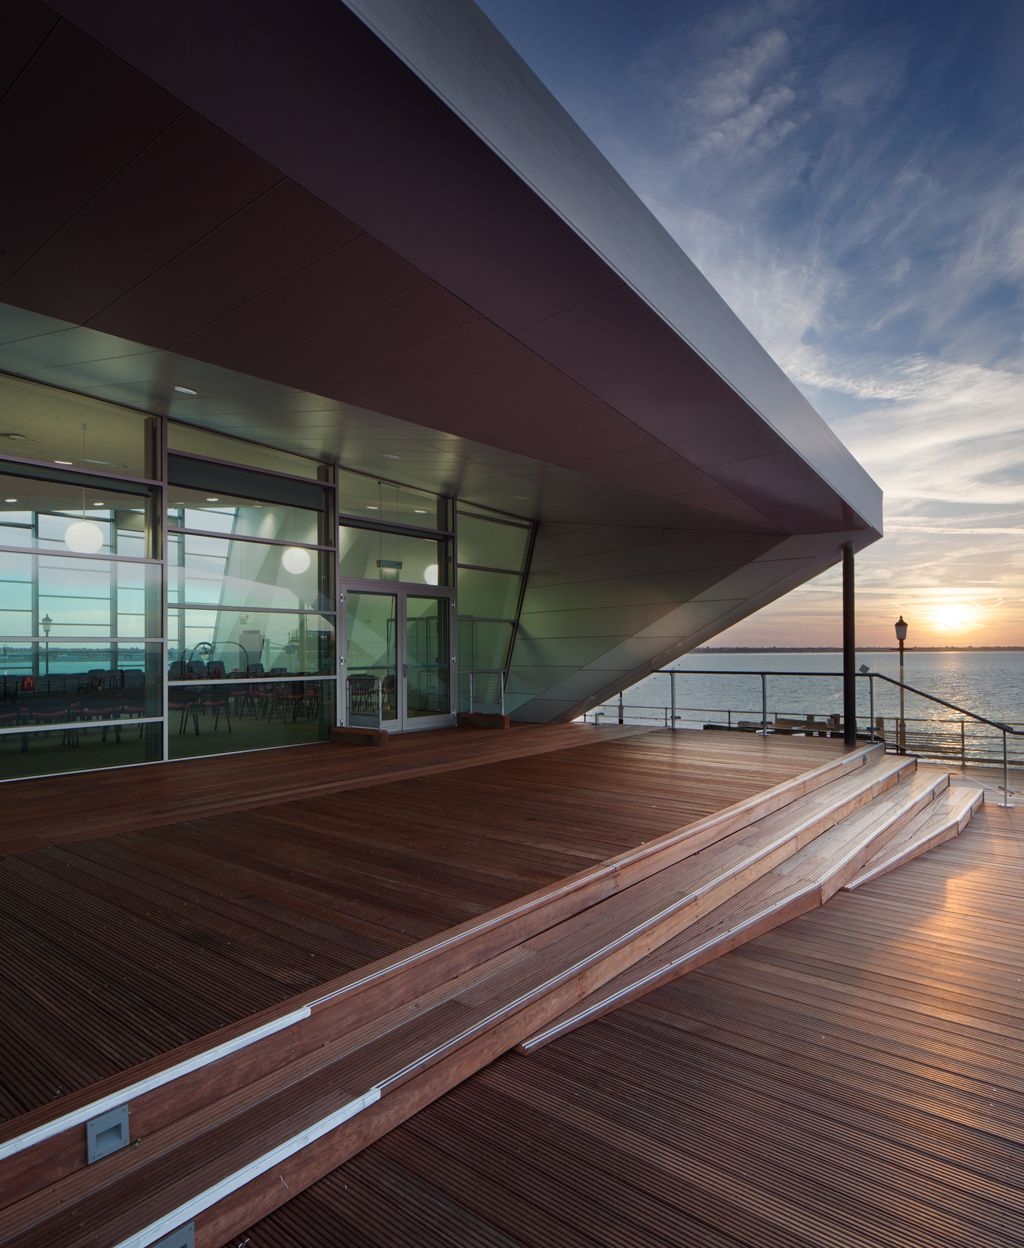 Royal Pavilion, Southend-on-Sea